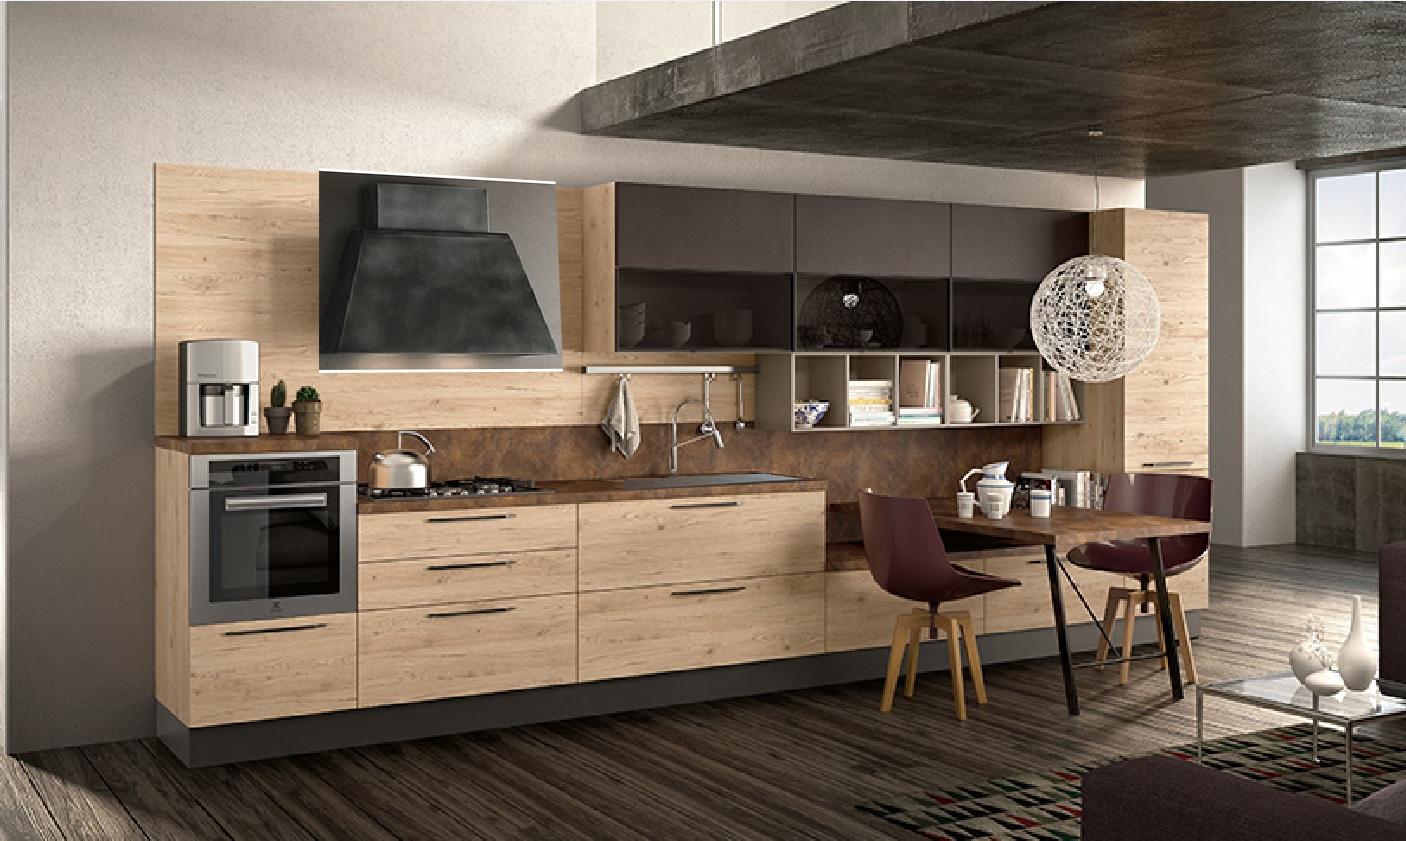 Cucina nuovi mondi cucine cucina moderna industrial in for Outlet cucine